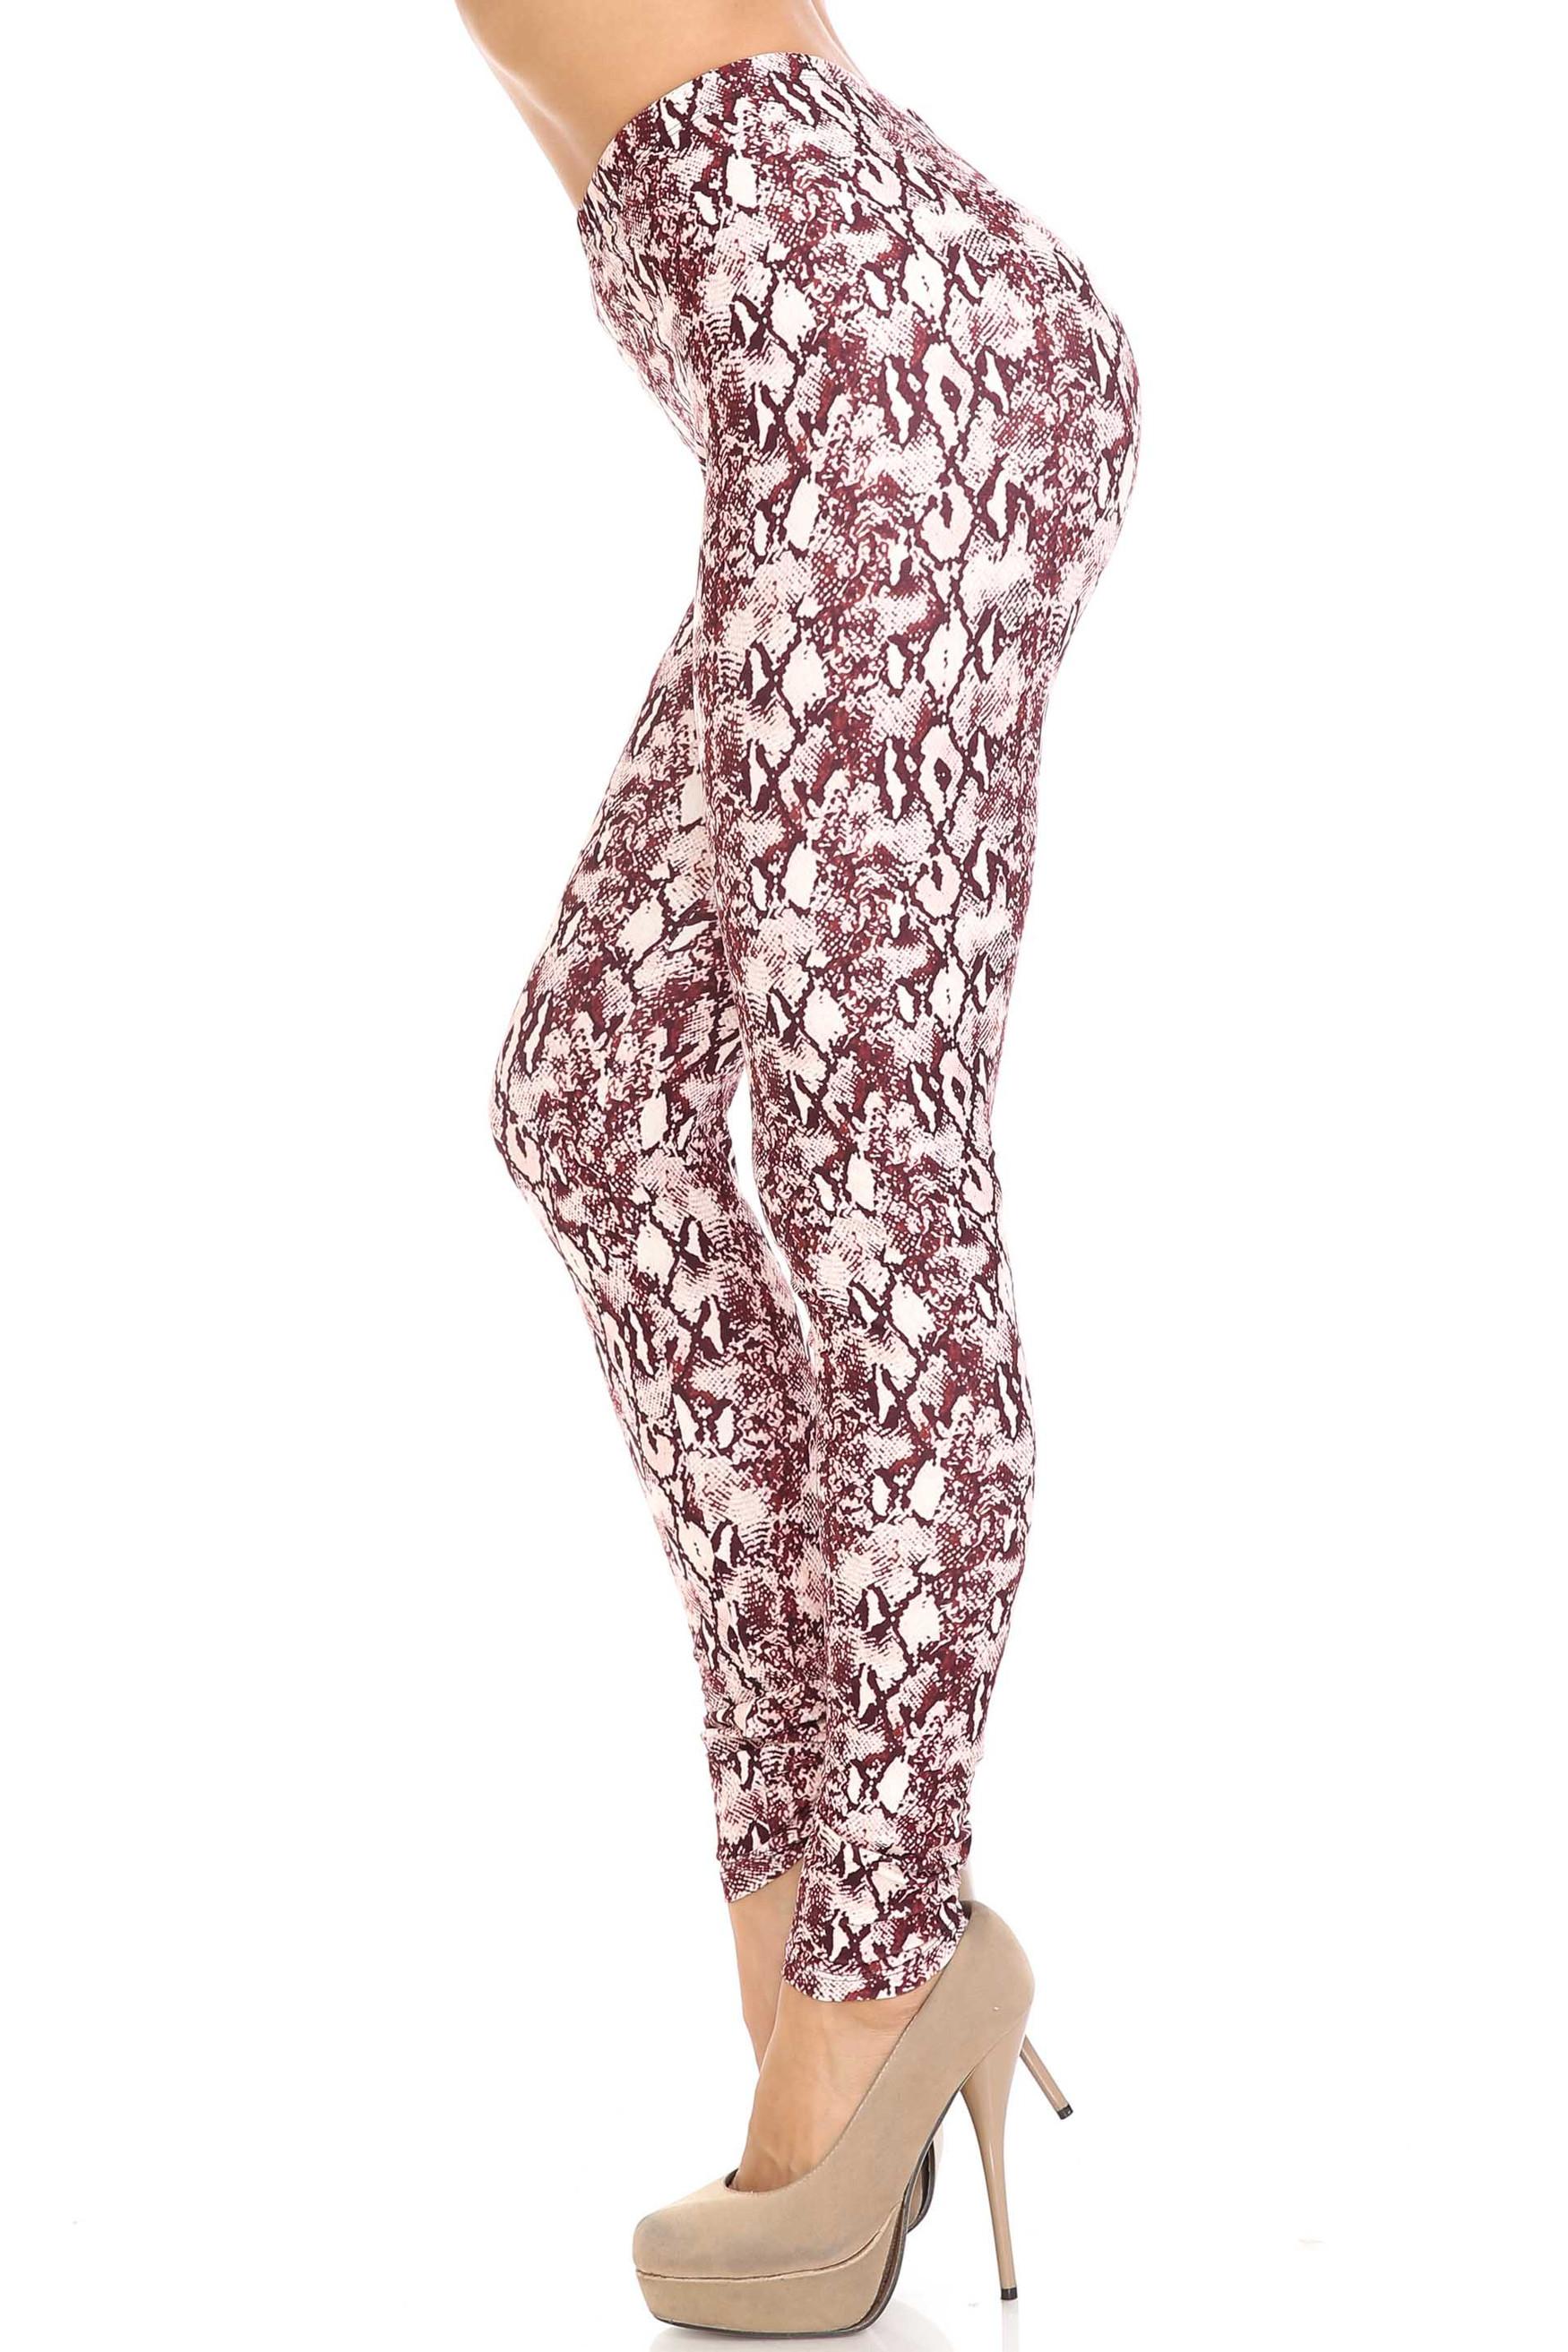 Creamy Soft Crimson Snakeskin Leggings - USA Fashion™